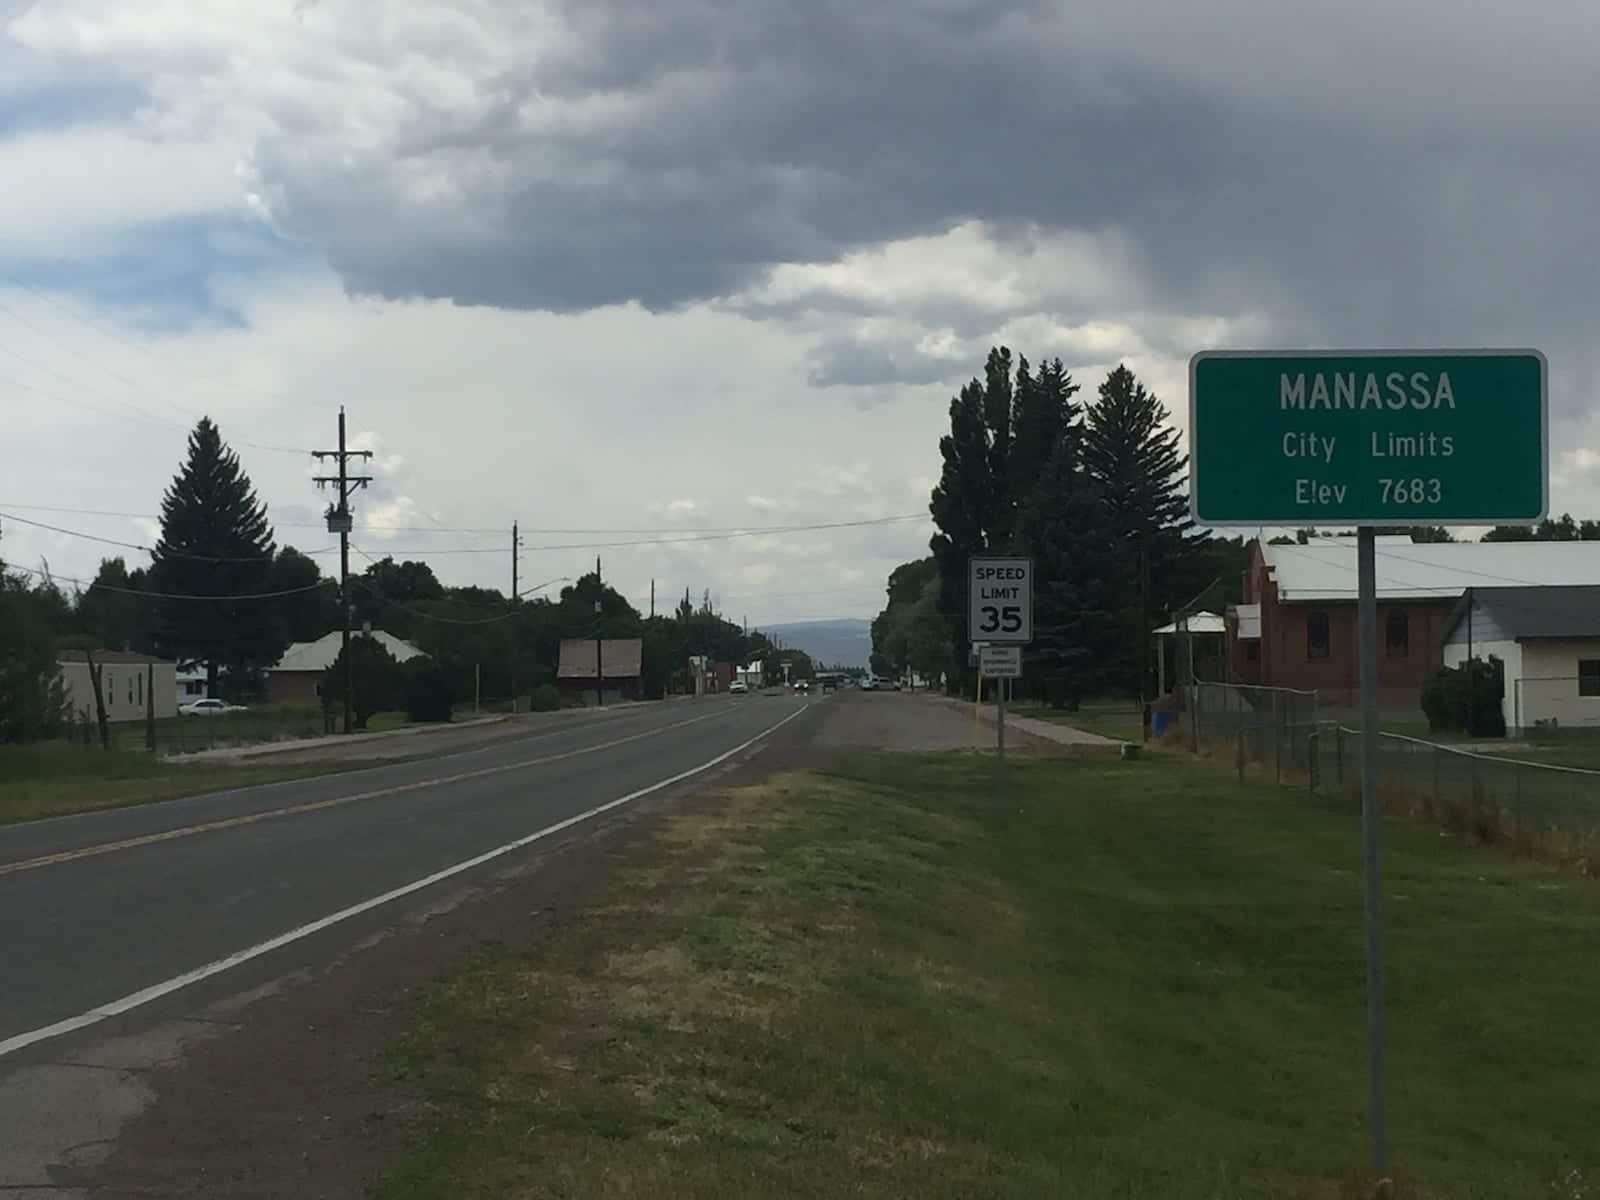 Manassa Colorado City Limits Sign